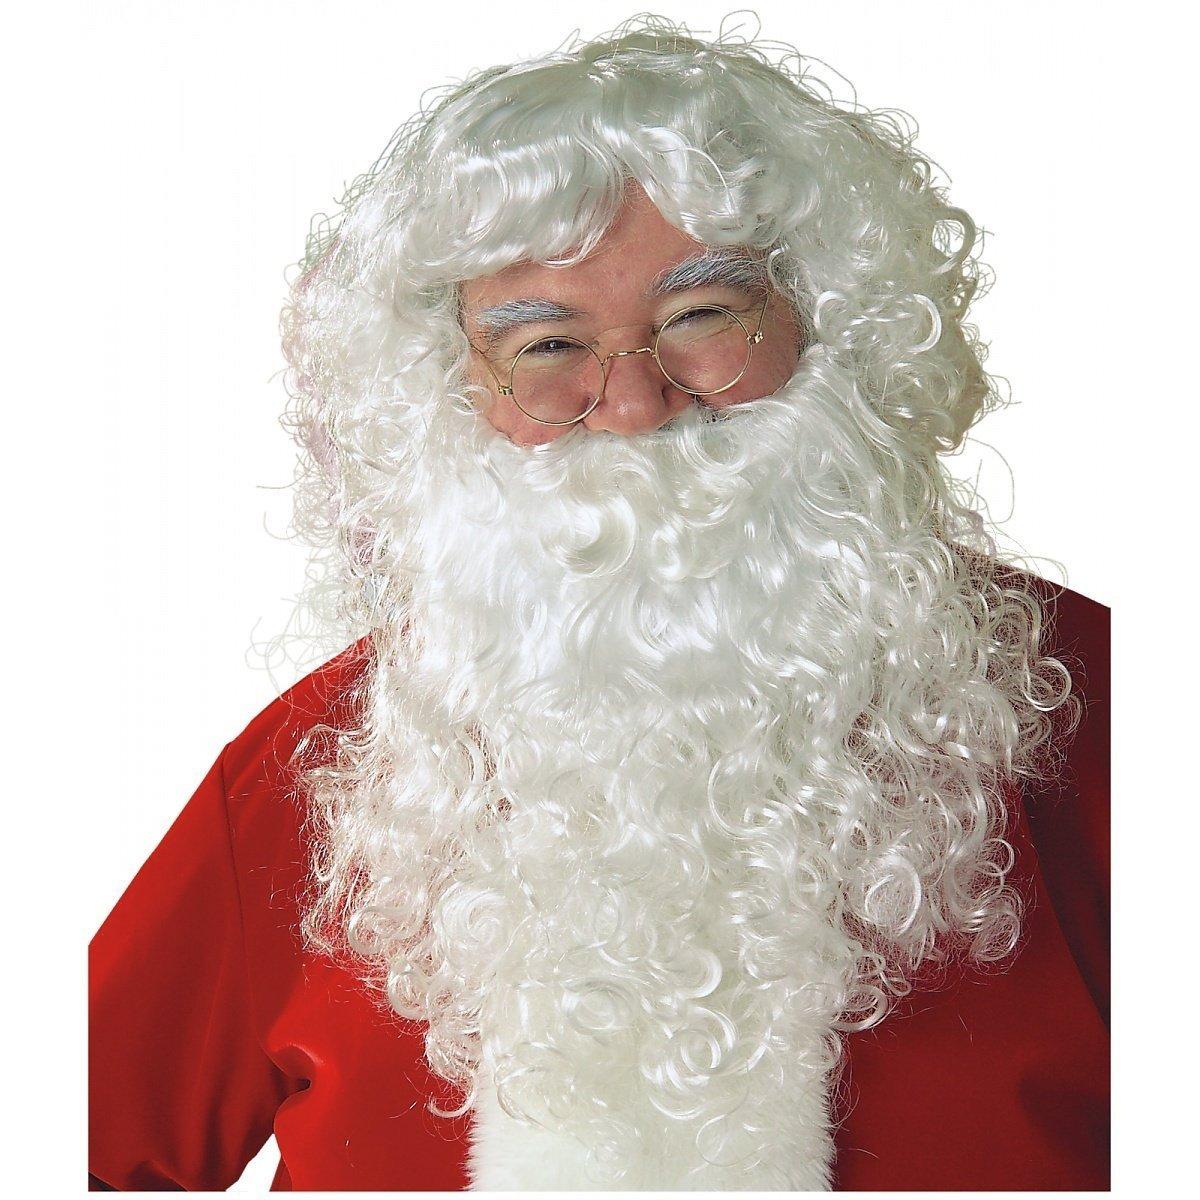 wig and beard father christmas santa claus st nicholas amazon co